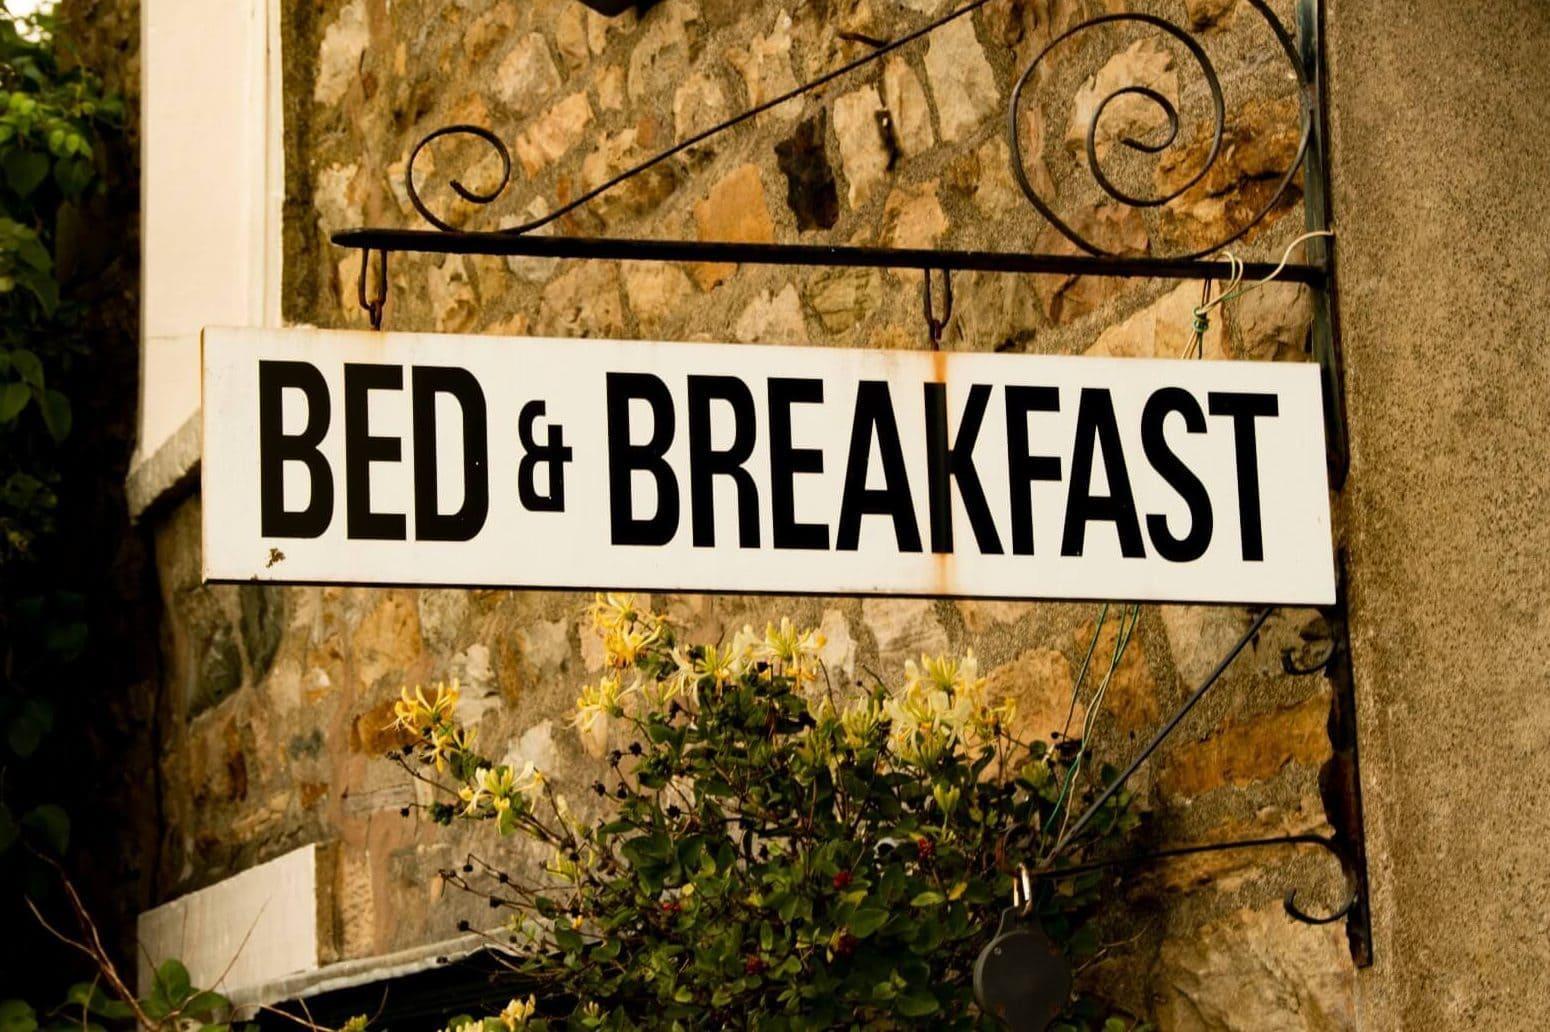 bed&breakfast uithangbord